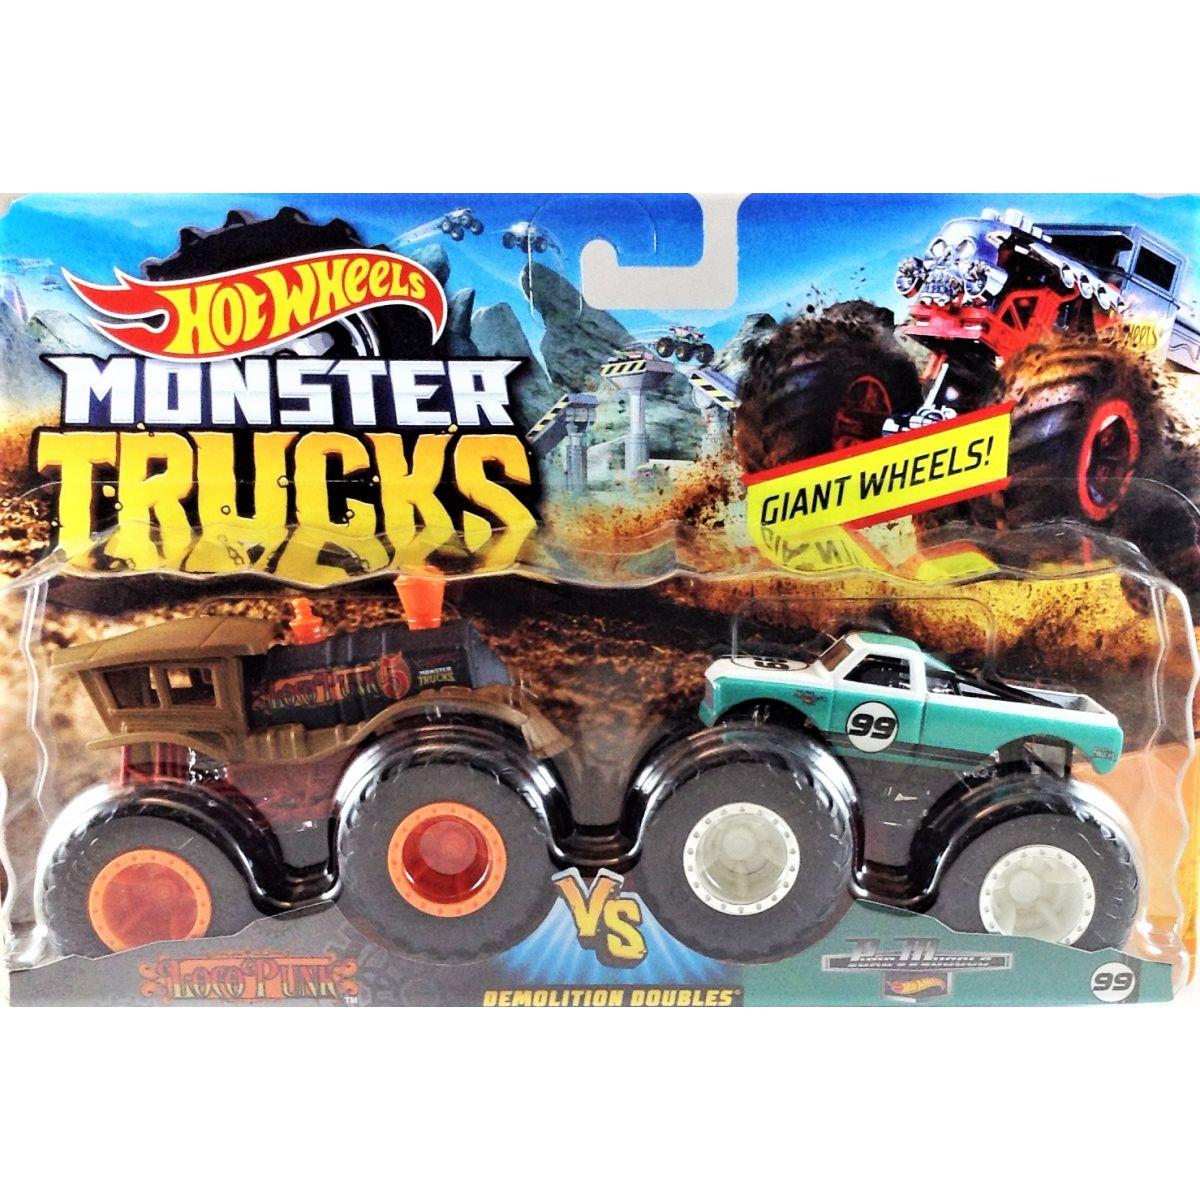 Mattel Hot Wheels Monster trucks demolačné duo LocoPunk VS Pure Musole FYJ66